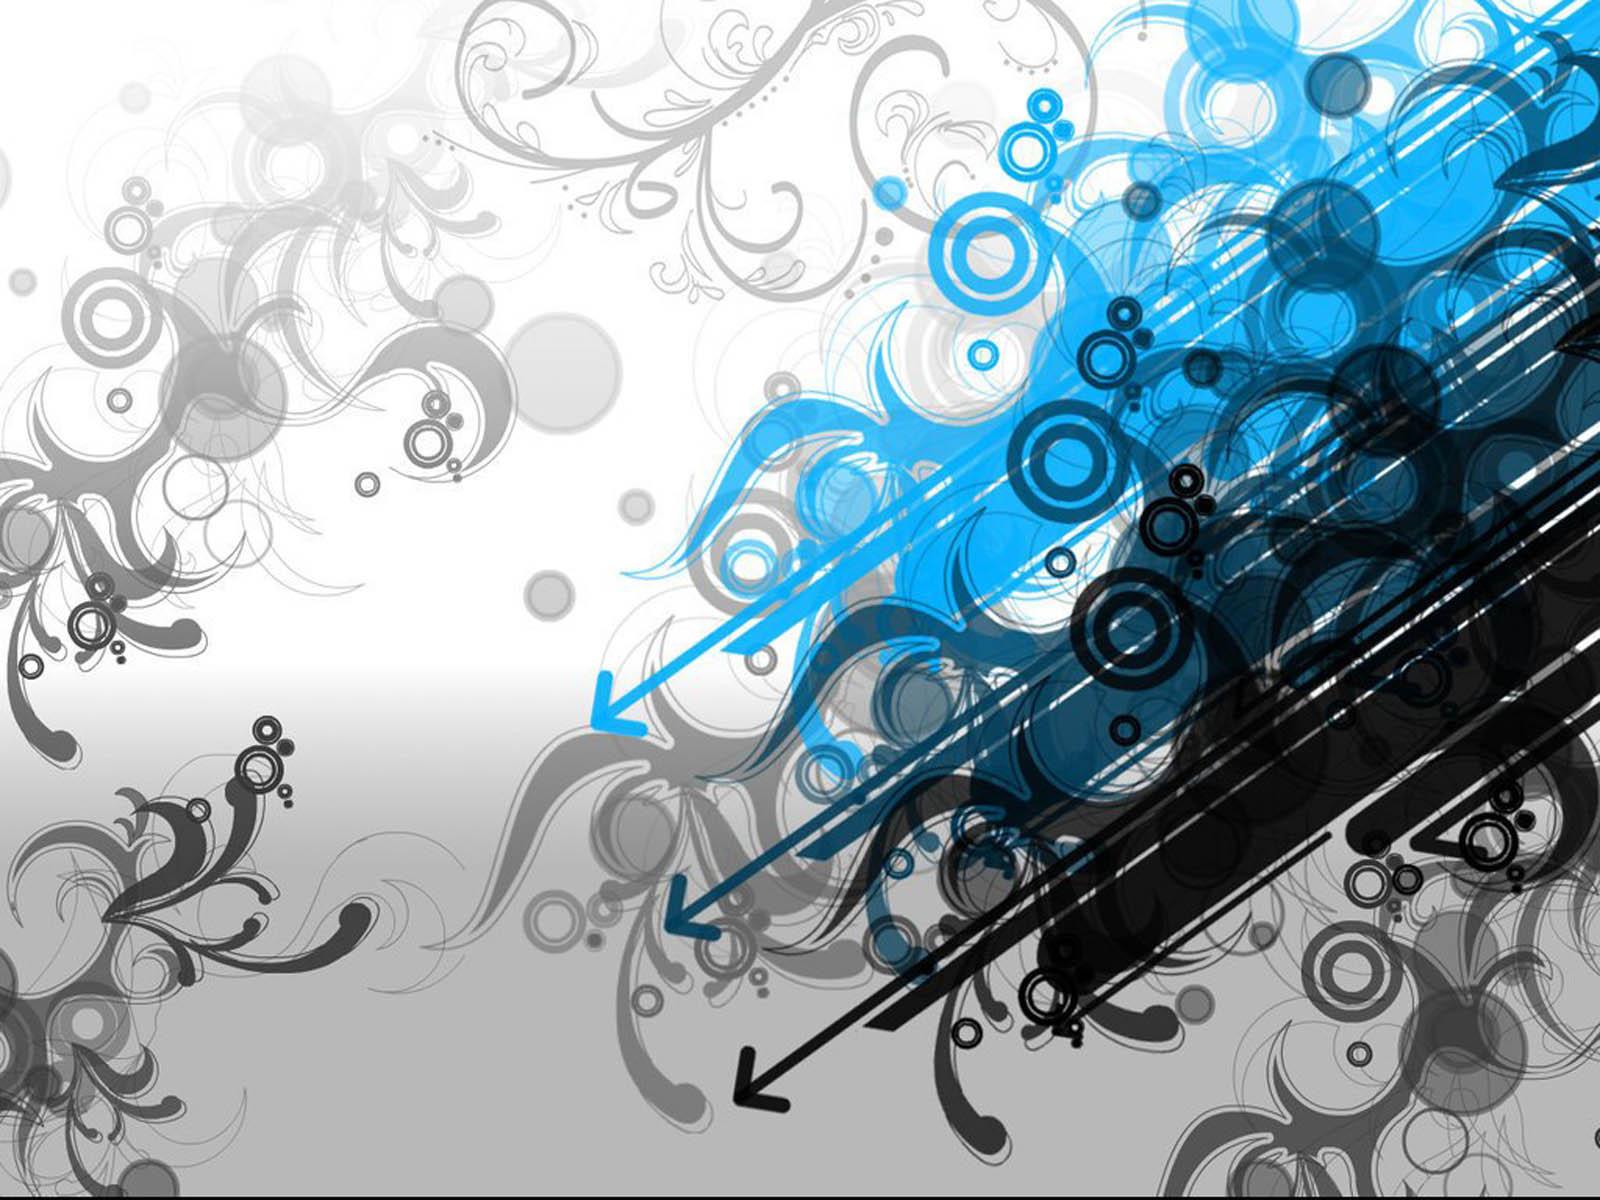 Wallpapers graphic abstract wallpapers - Graphic design desktop wallpaper hd ...